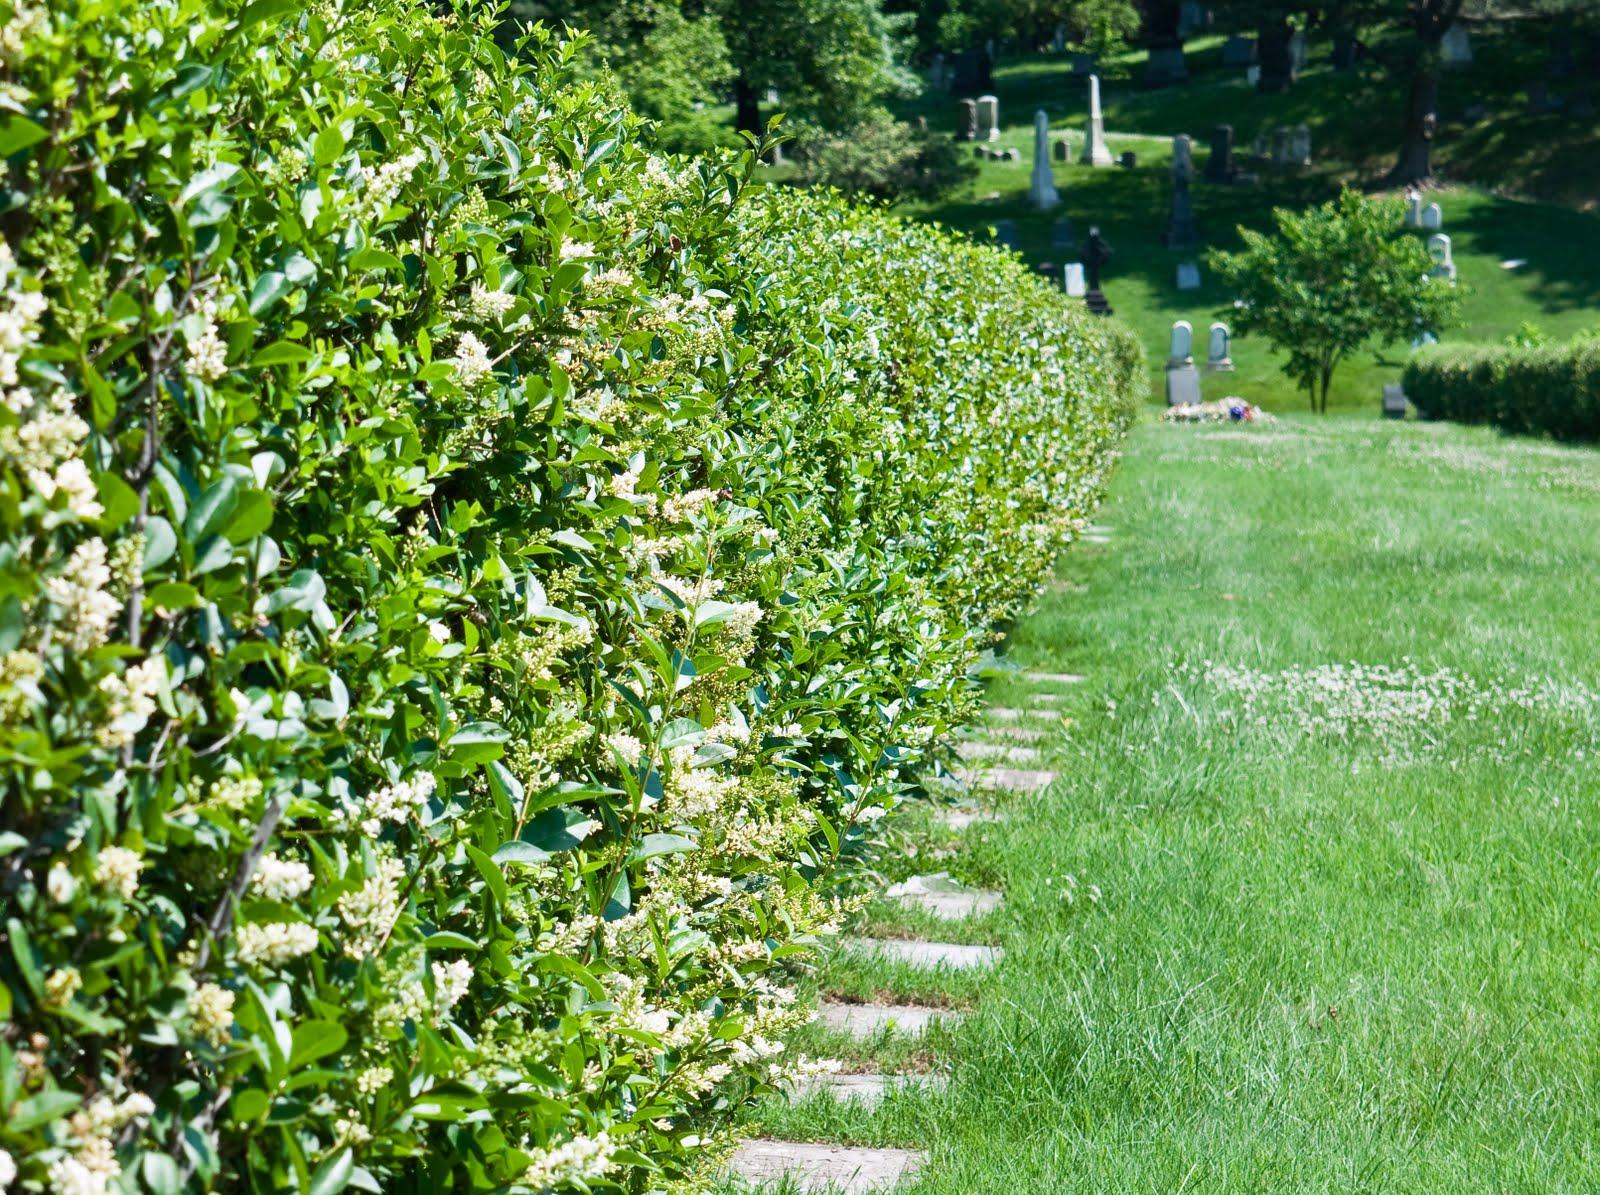 green wood cemetery trees privet